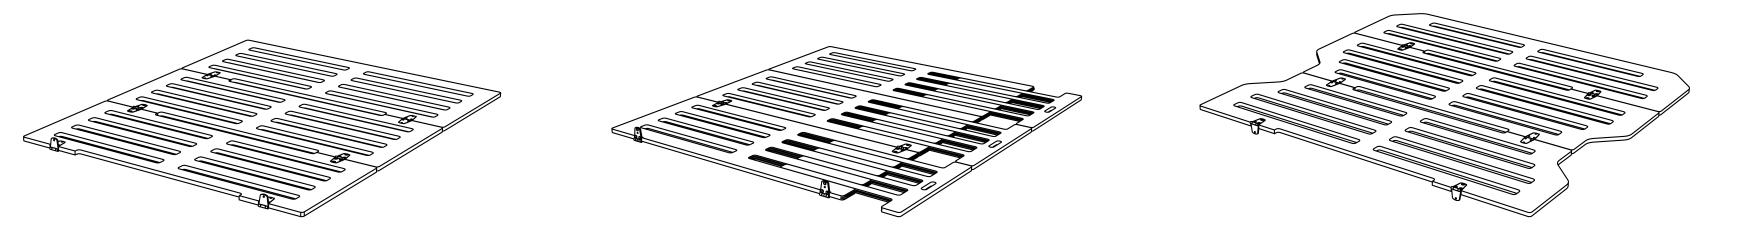 cama-estructura-1b.jpg